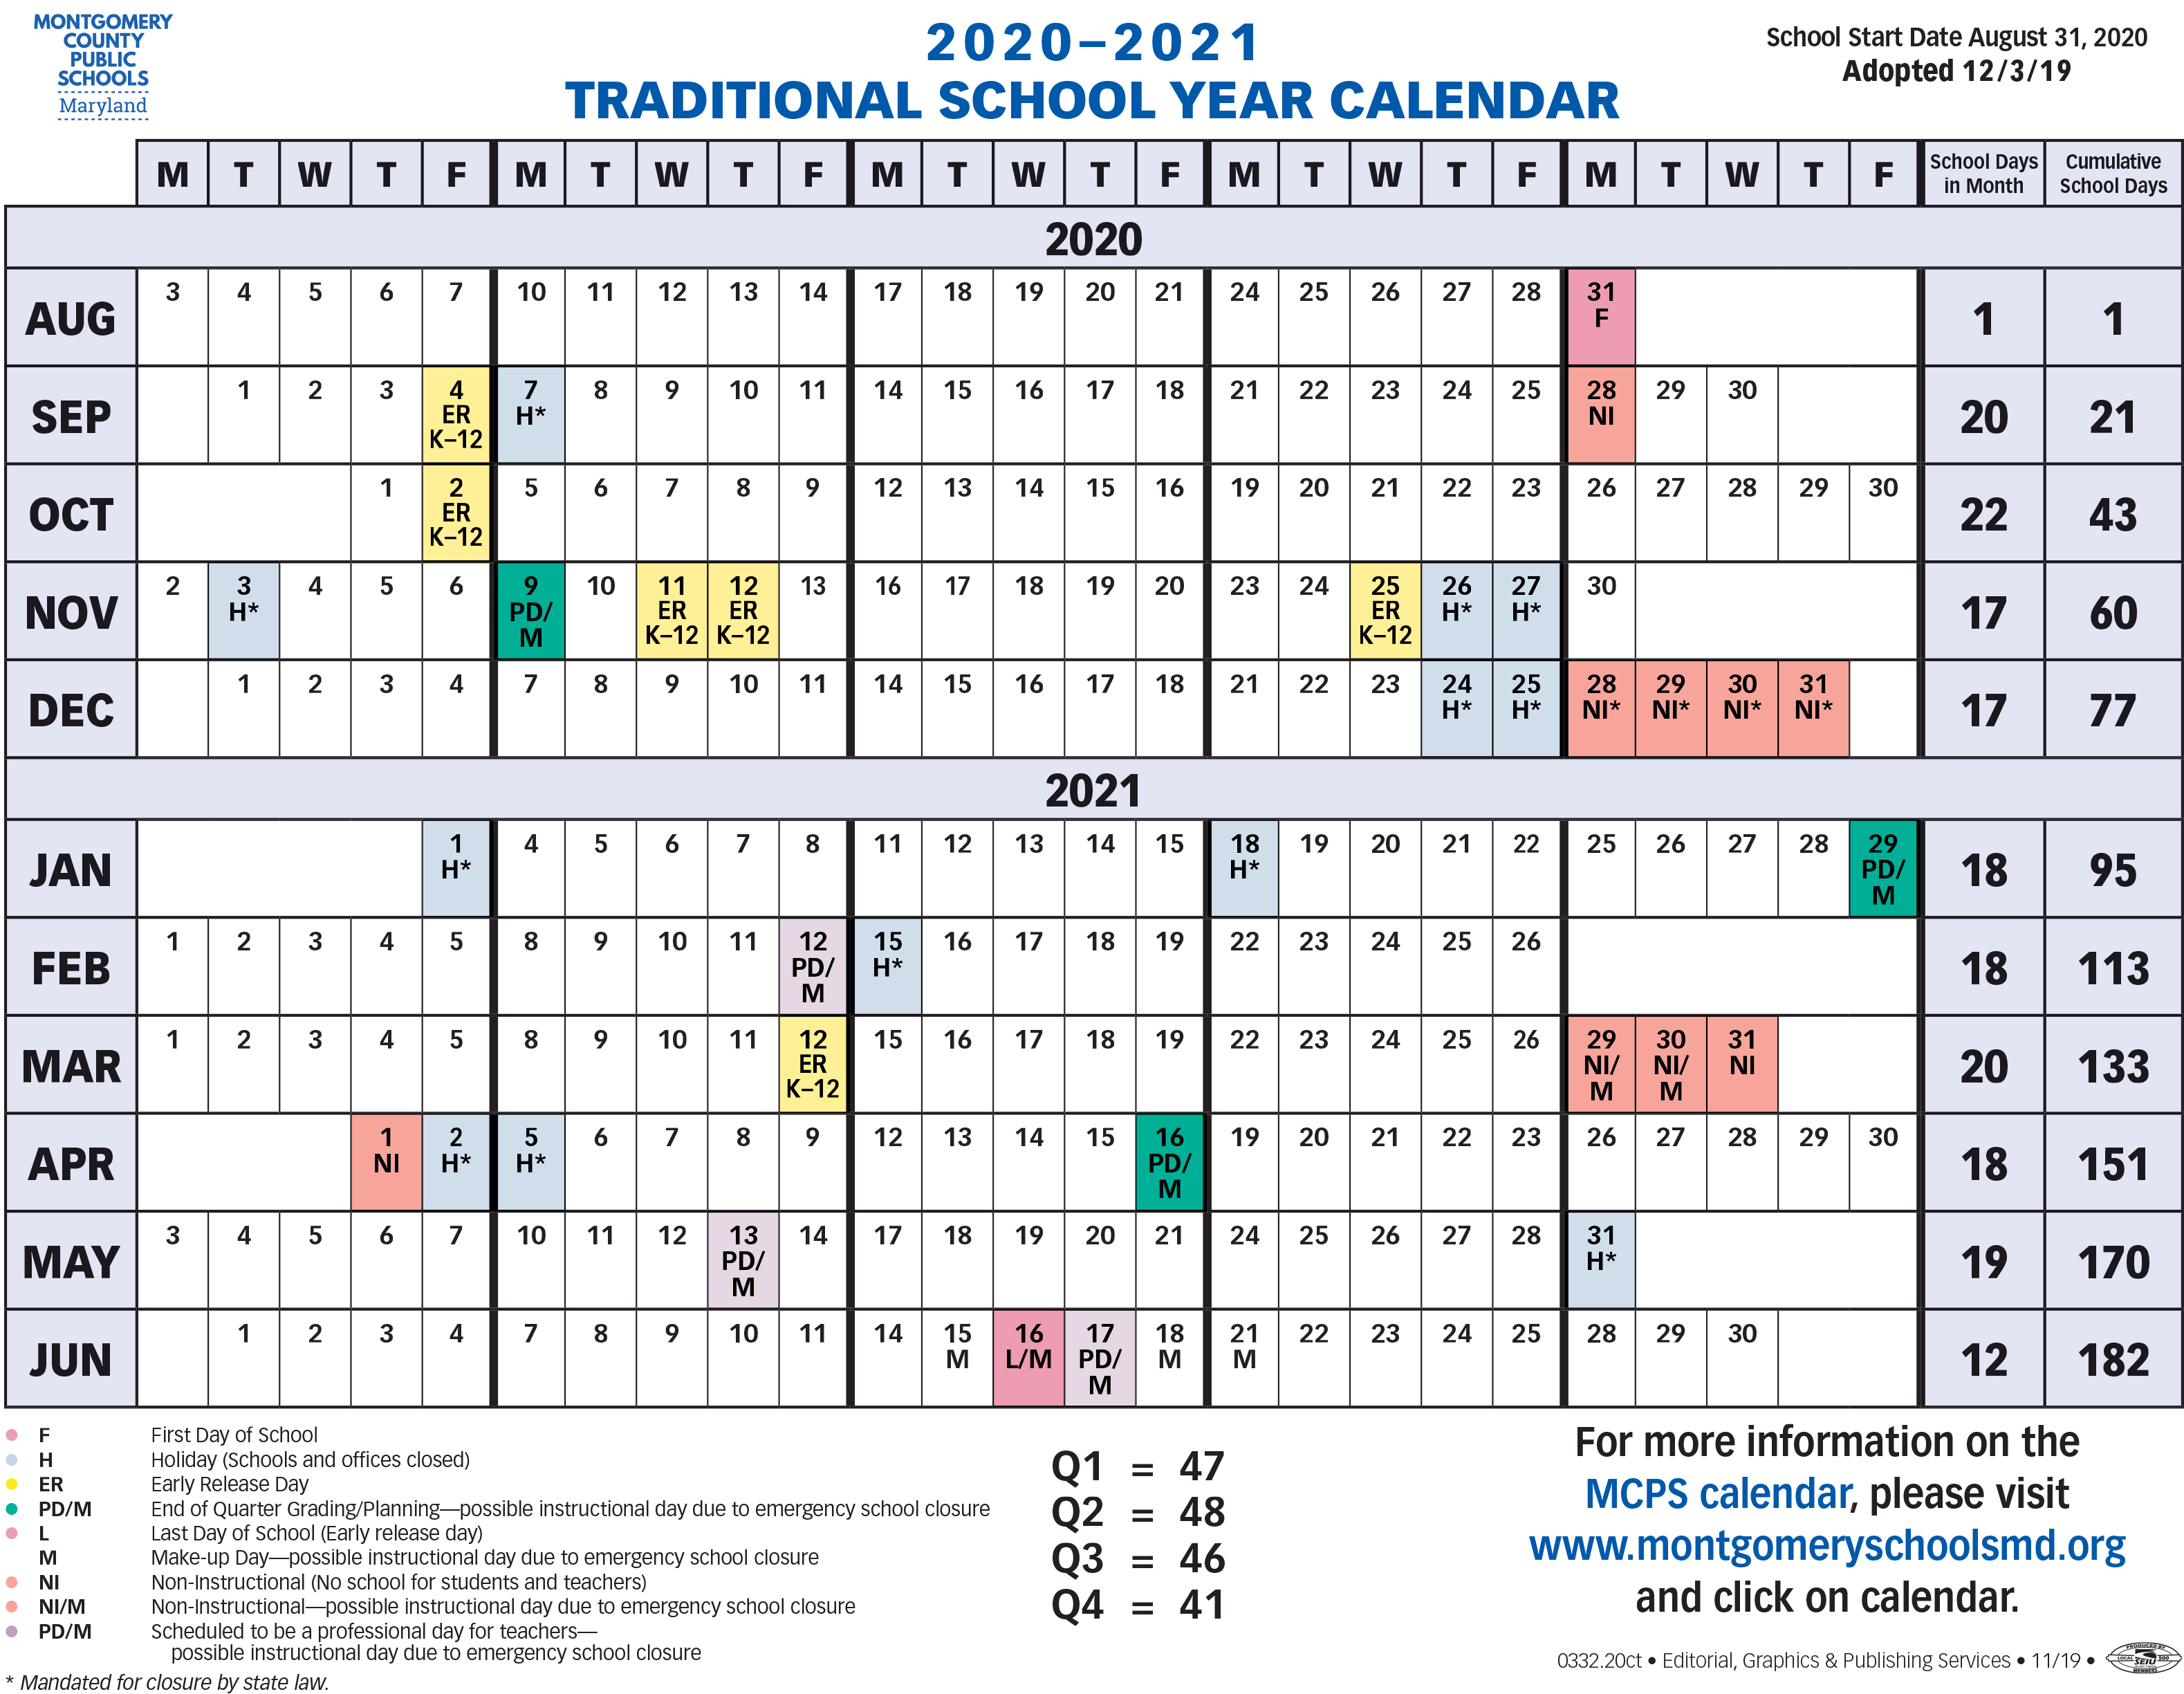 Proposed Calendar 2020 2021 - Montgomery County Public Within Alachua School Board Calendar